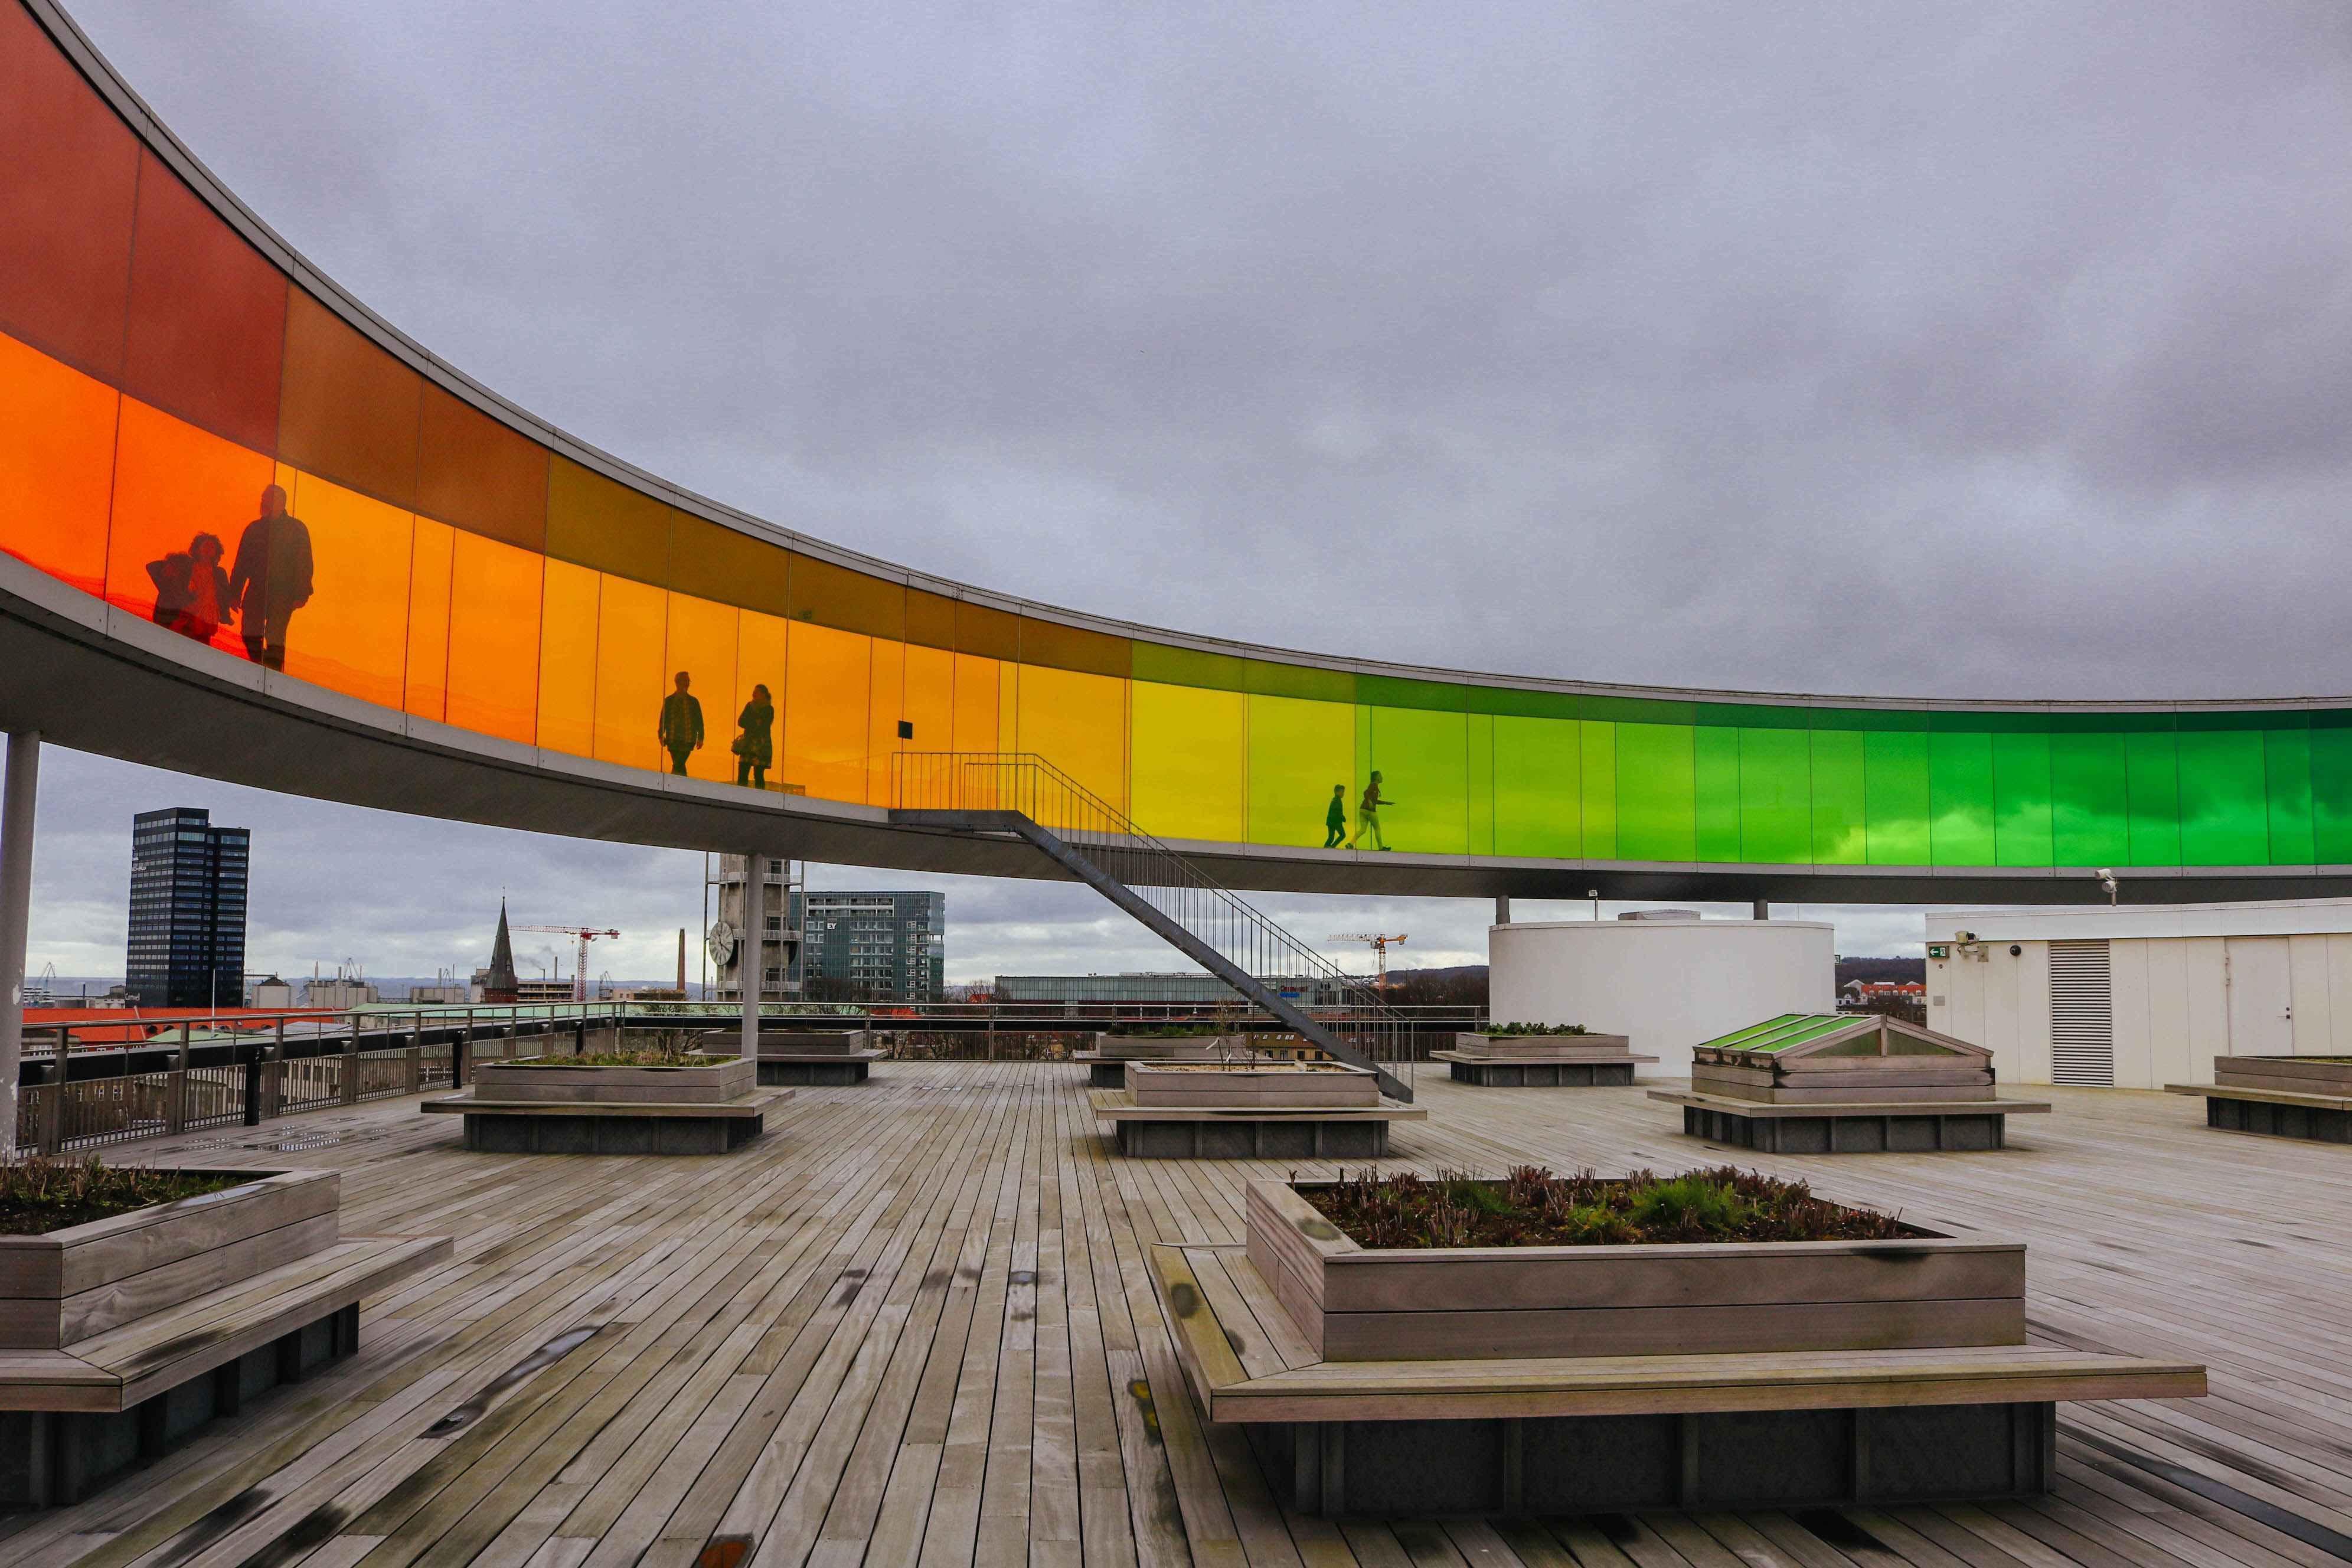 AROS 3 1024x683 - Why You Should Visit Aarhus Before 2018